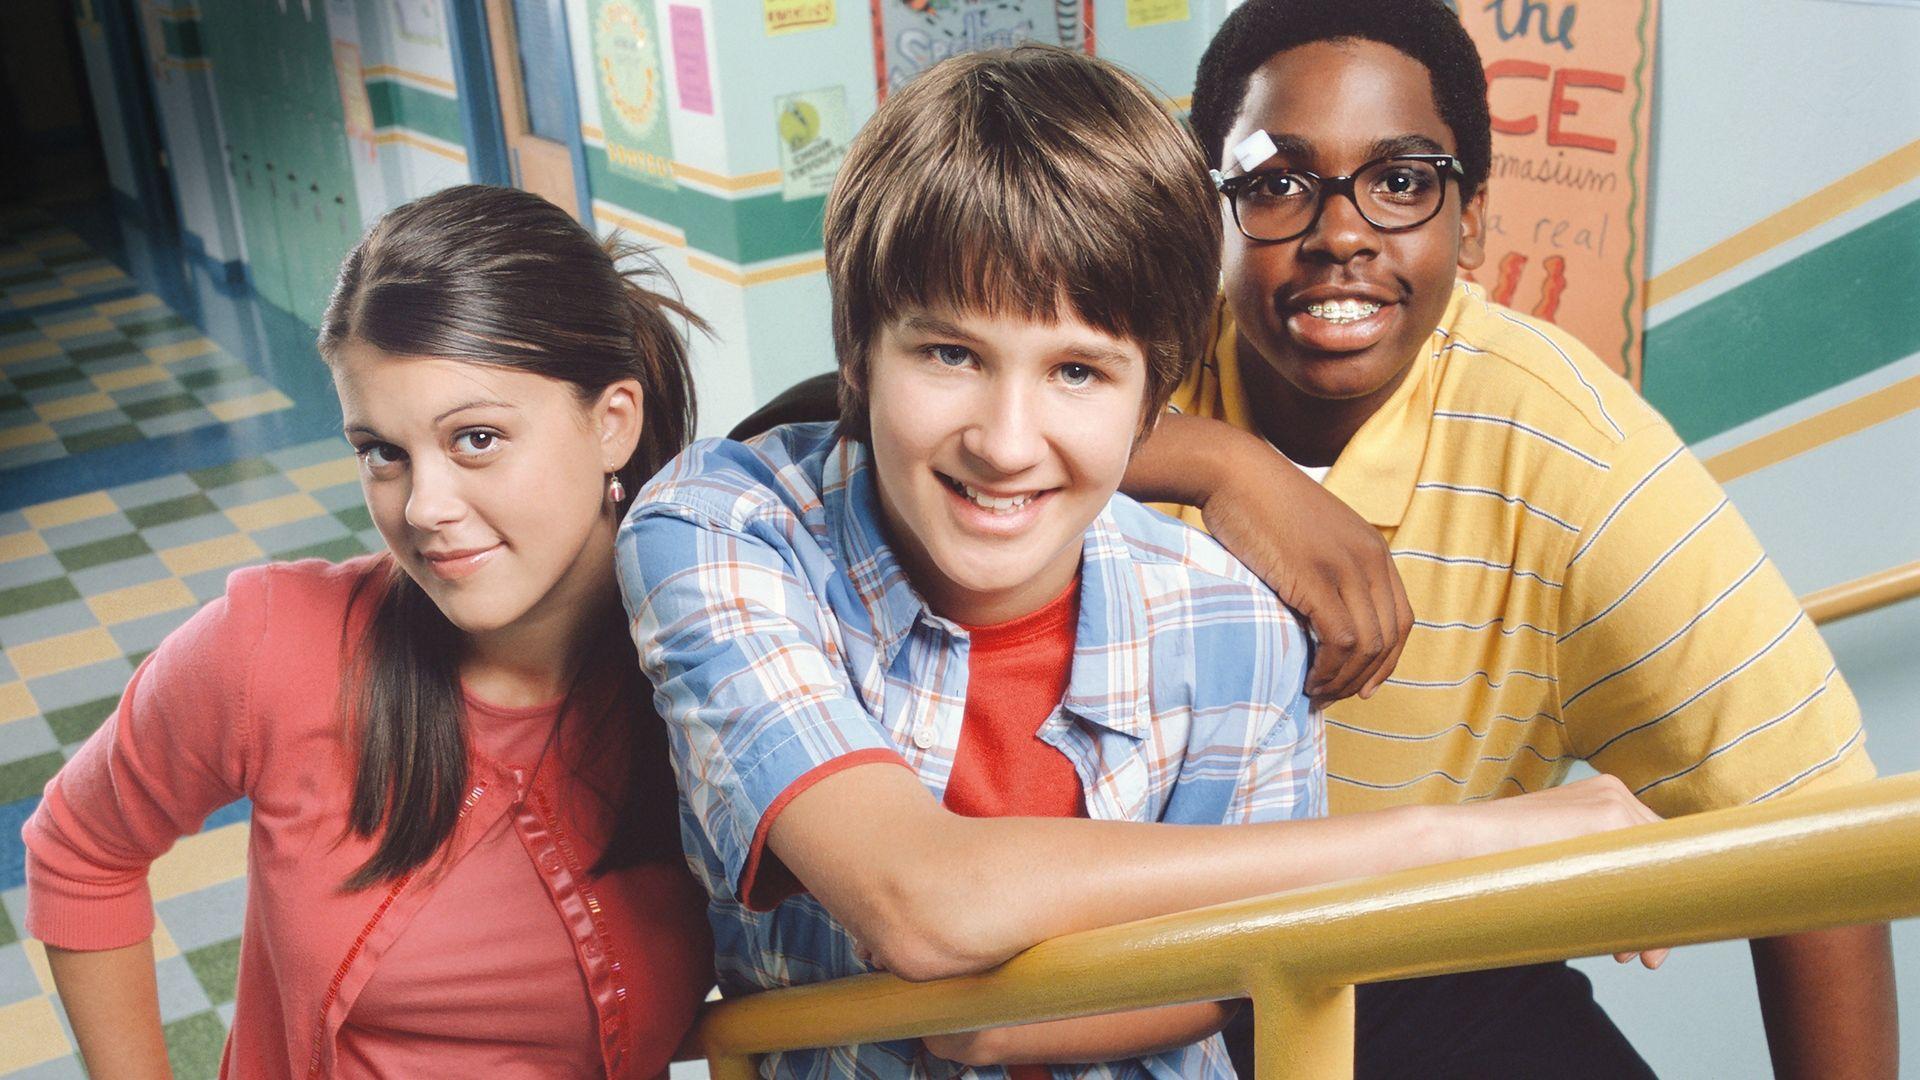 Neds Declassified School Survival Guide - Season 3 Episode ...